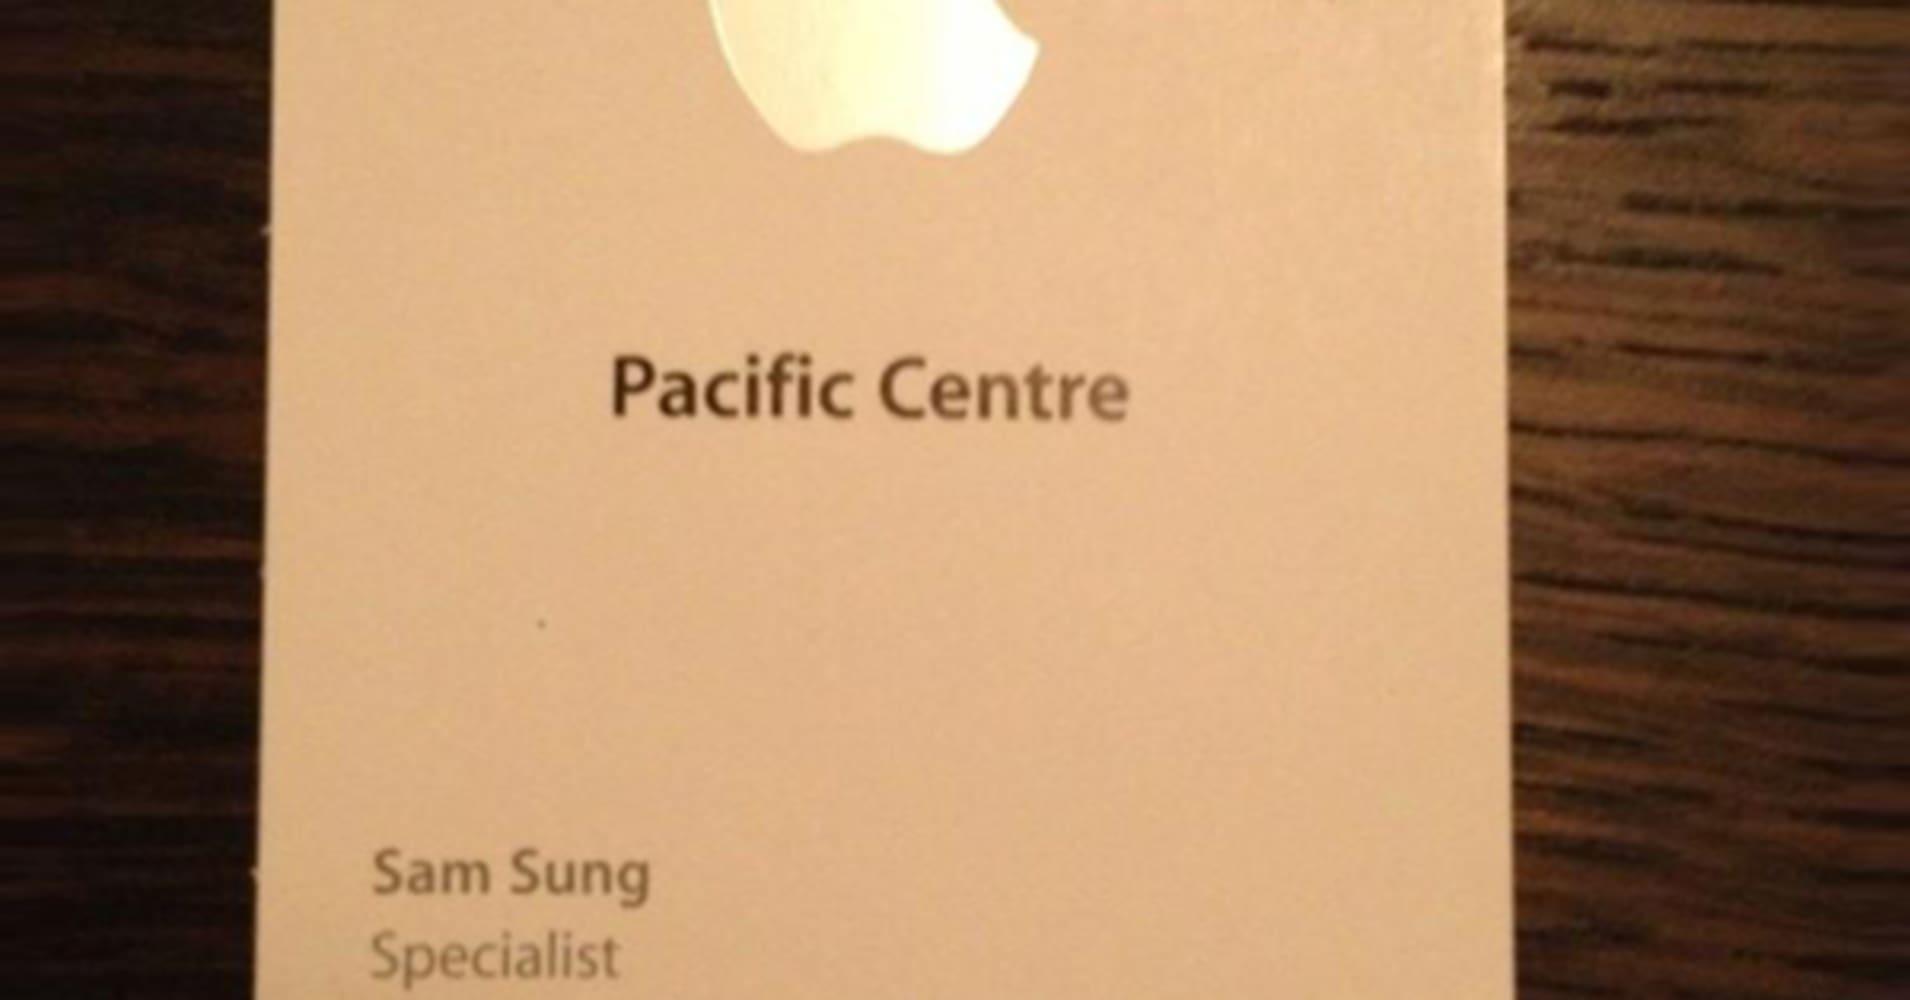 Man Named Sam Sung No Longer Works At Apple